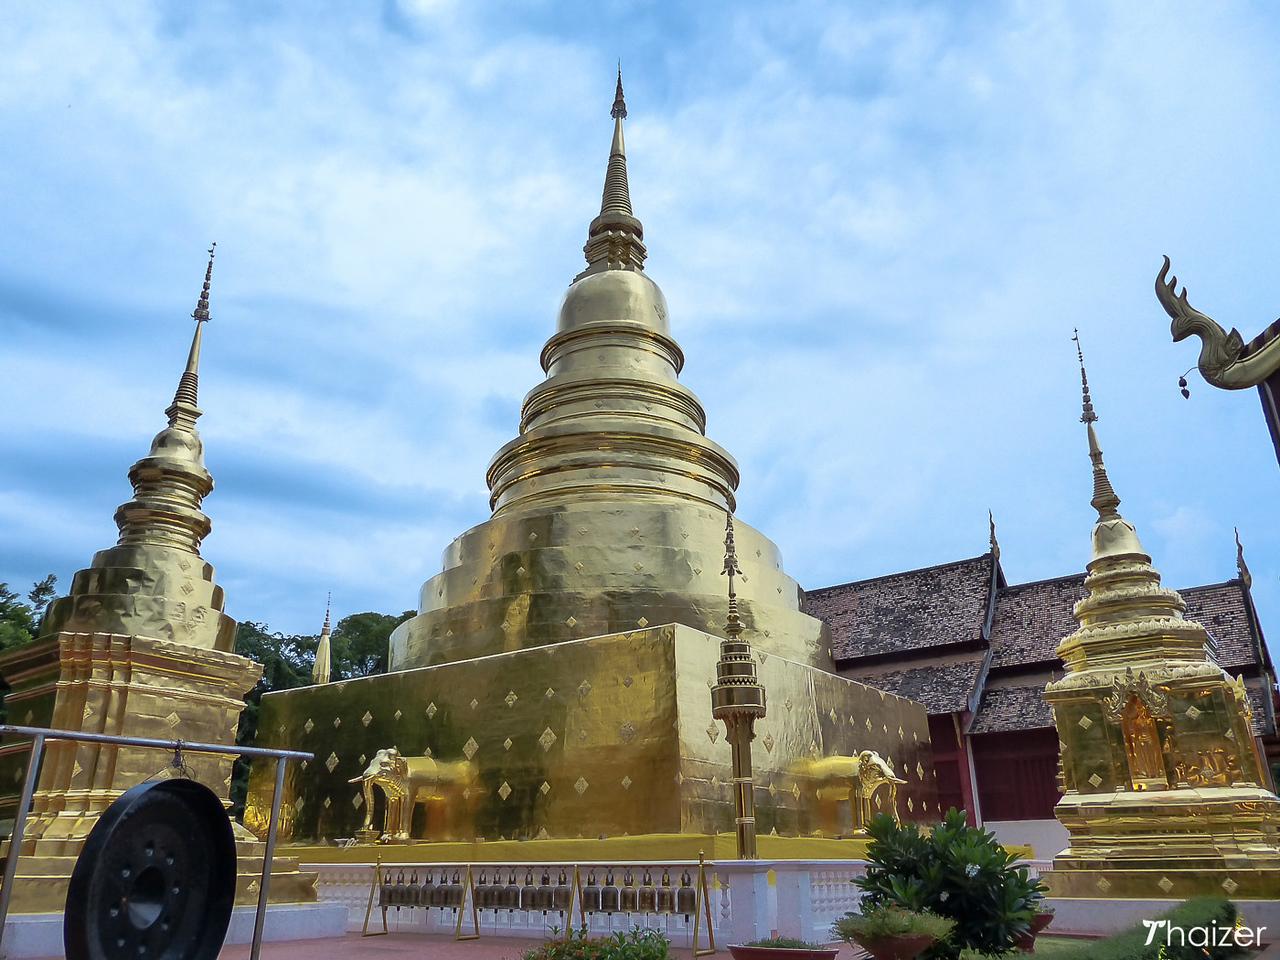 chedi at Wat Phra Singh, Chiang Mai